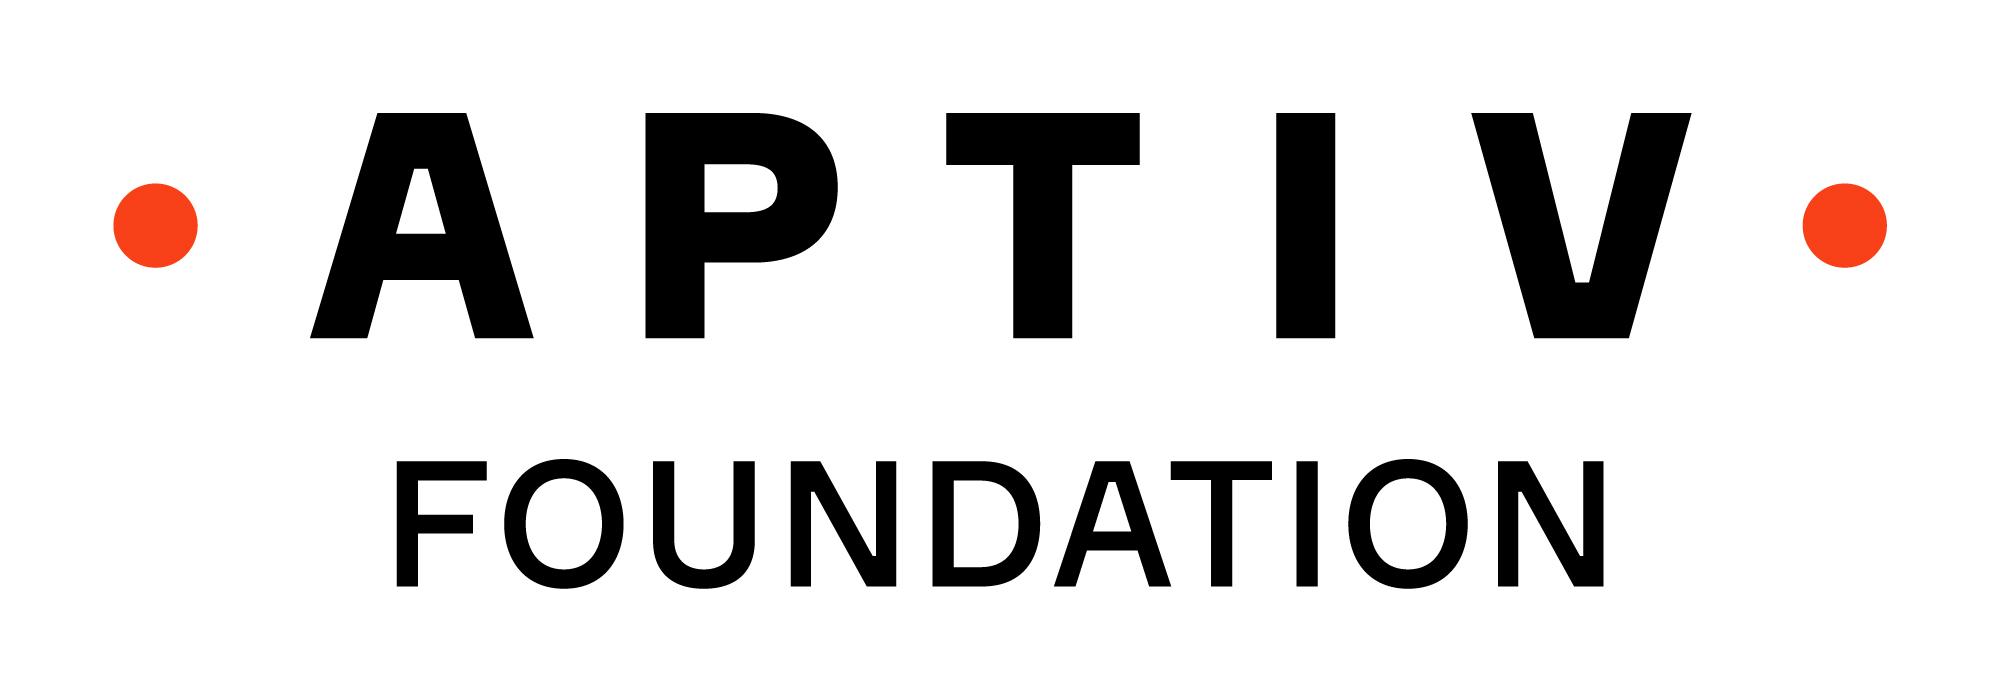 aptiv_foundation_logo_color_rgb.jpg